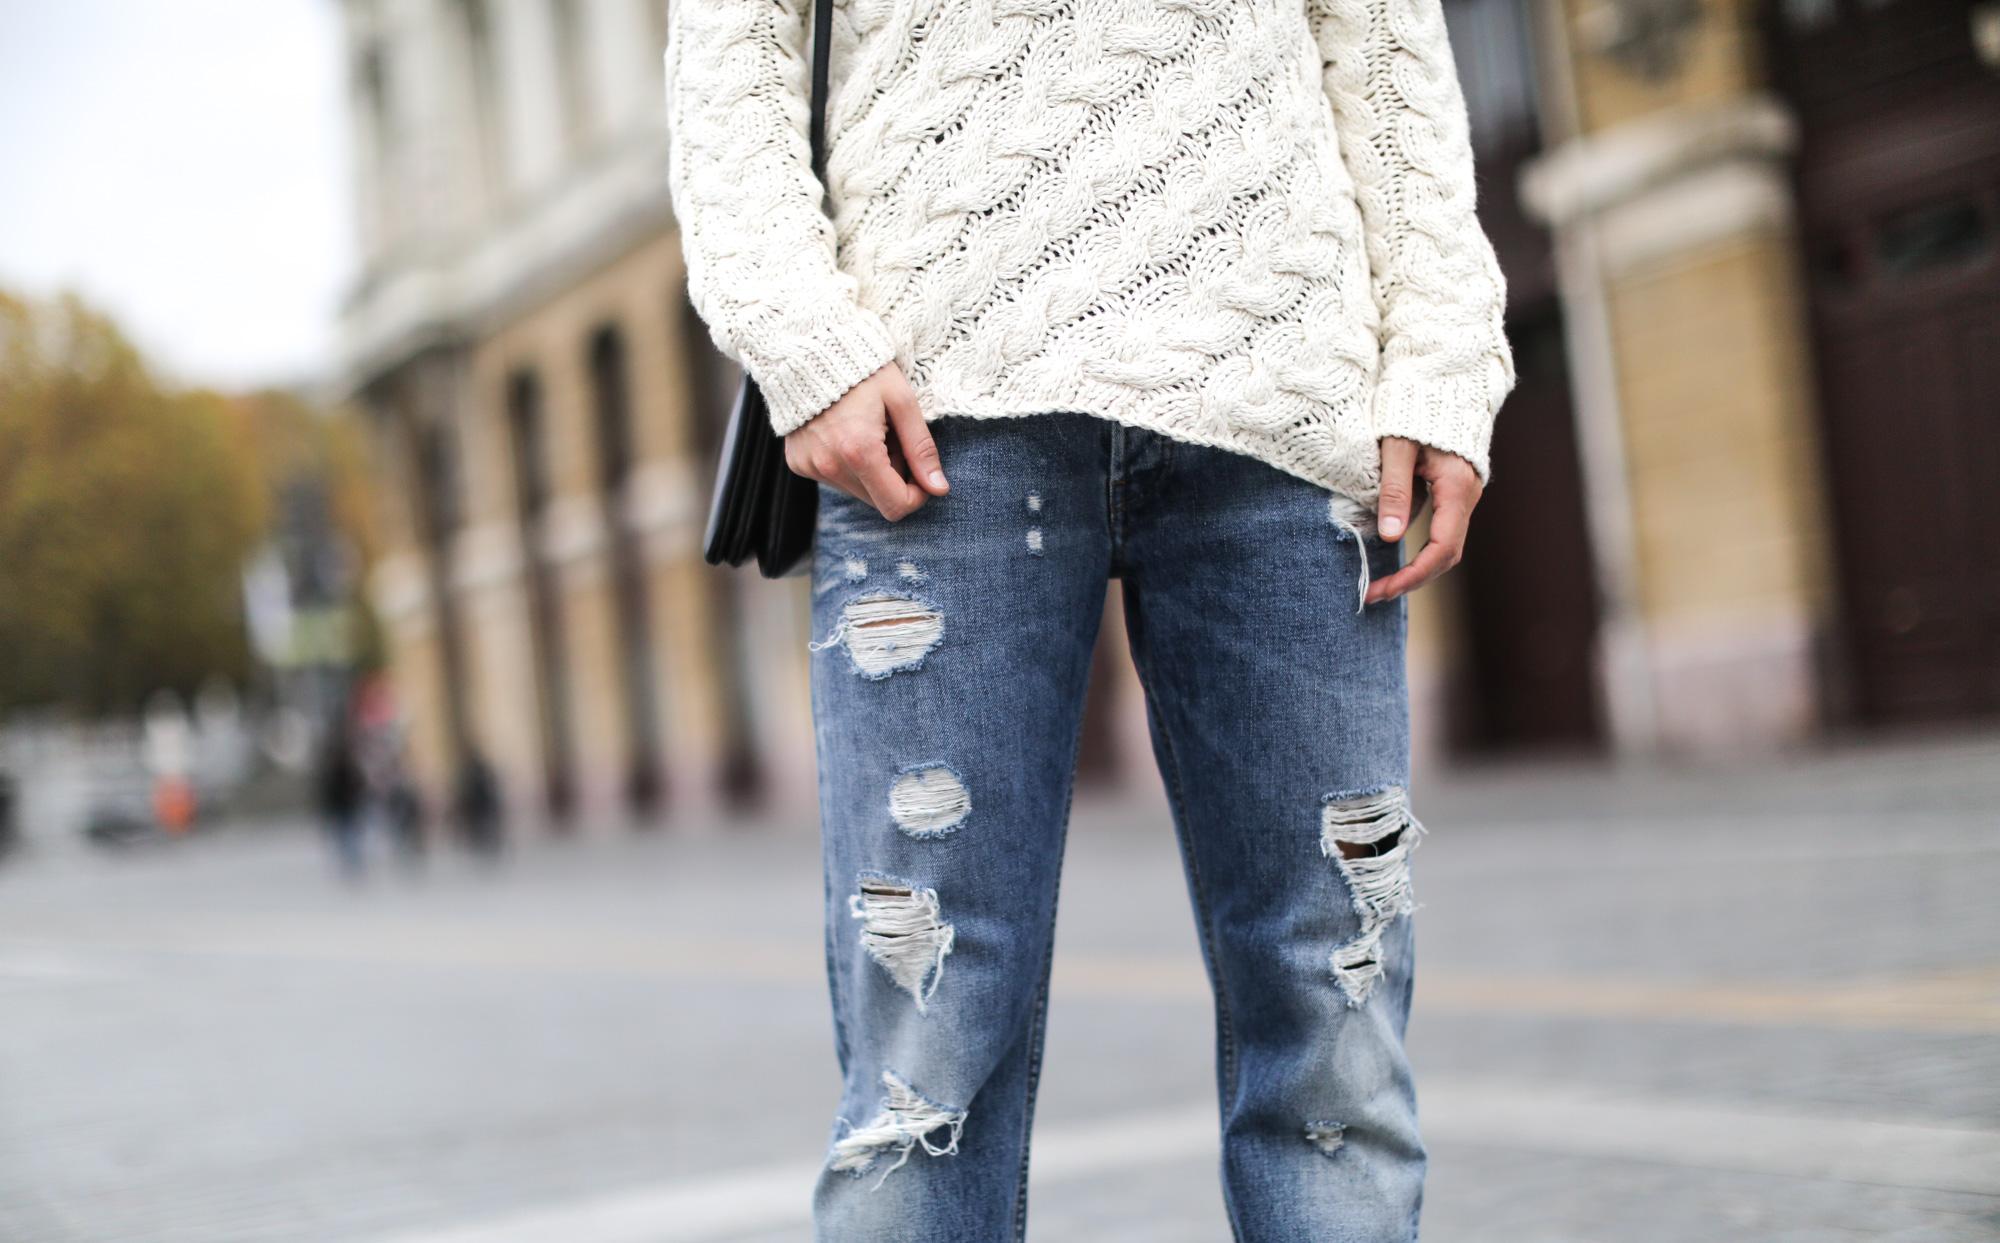 Clochet-streetstyle-isabel-marant-etoile-ellison-parka-acne-studios-jeans-adidas-stan-smith-11